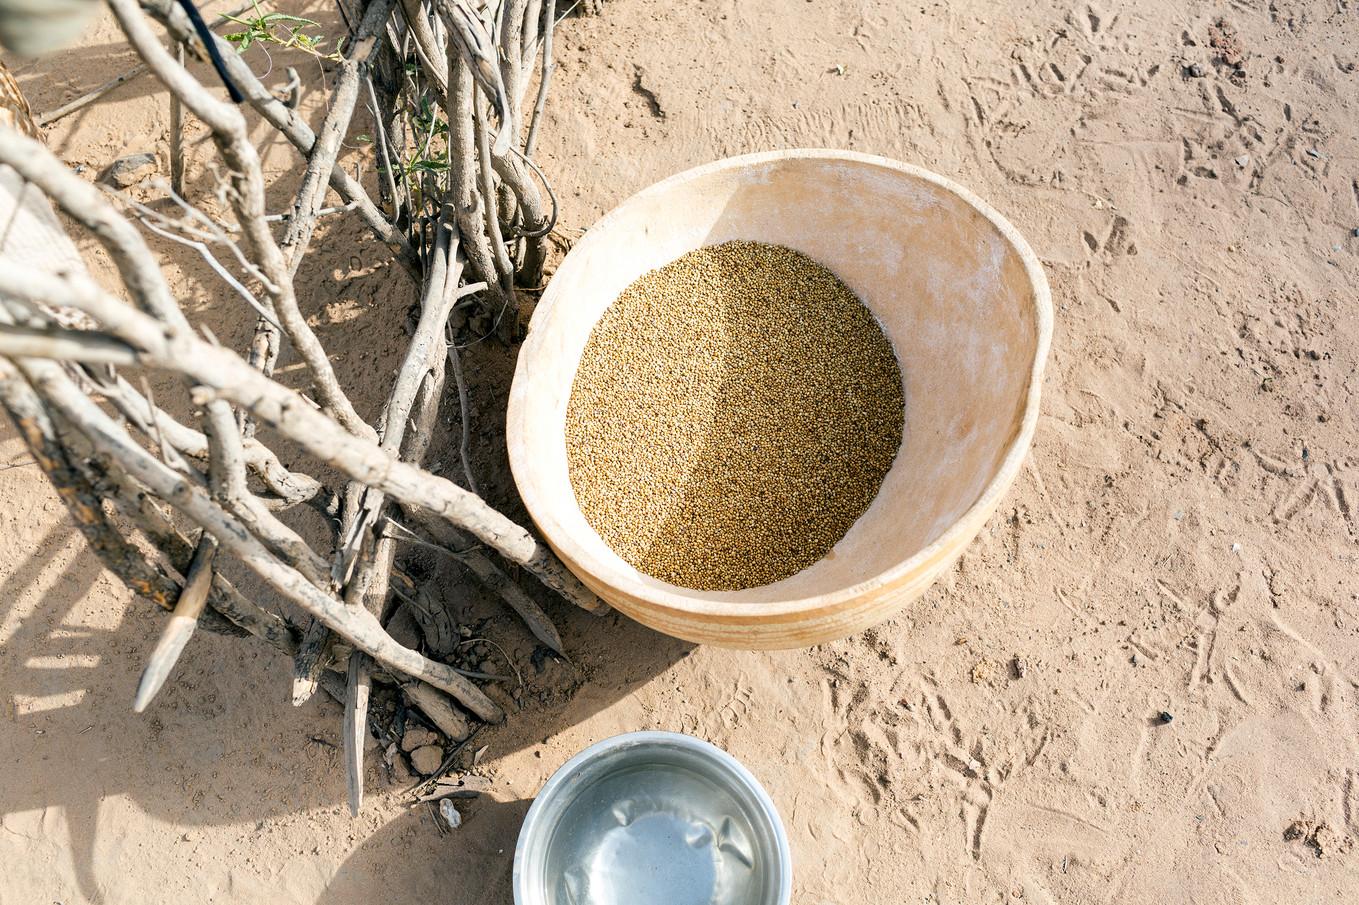 NGO_CSR-CARE-Niger 006.jpg